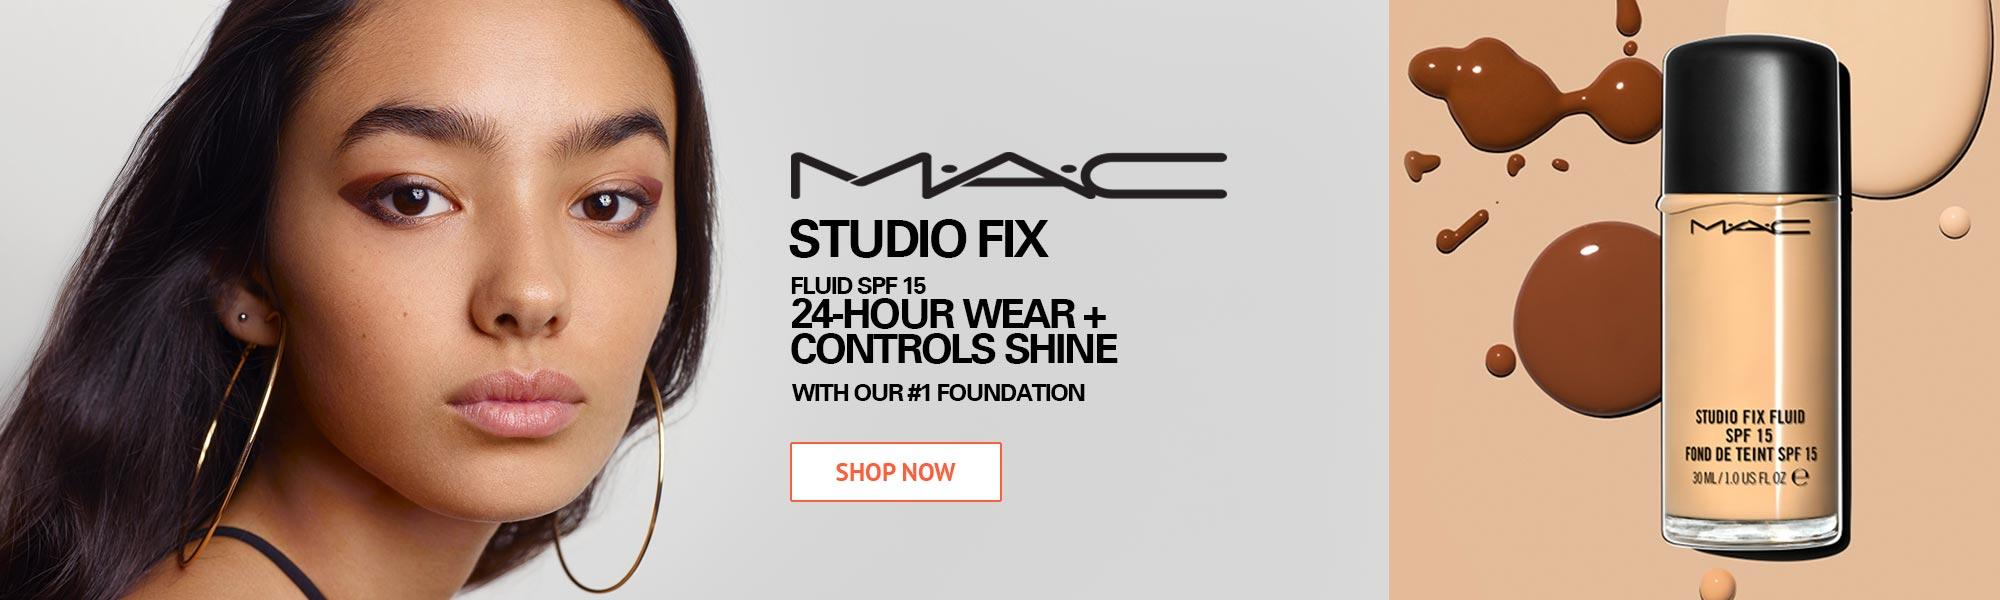 Mac-Studio-fix